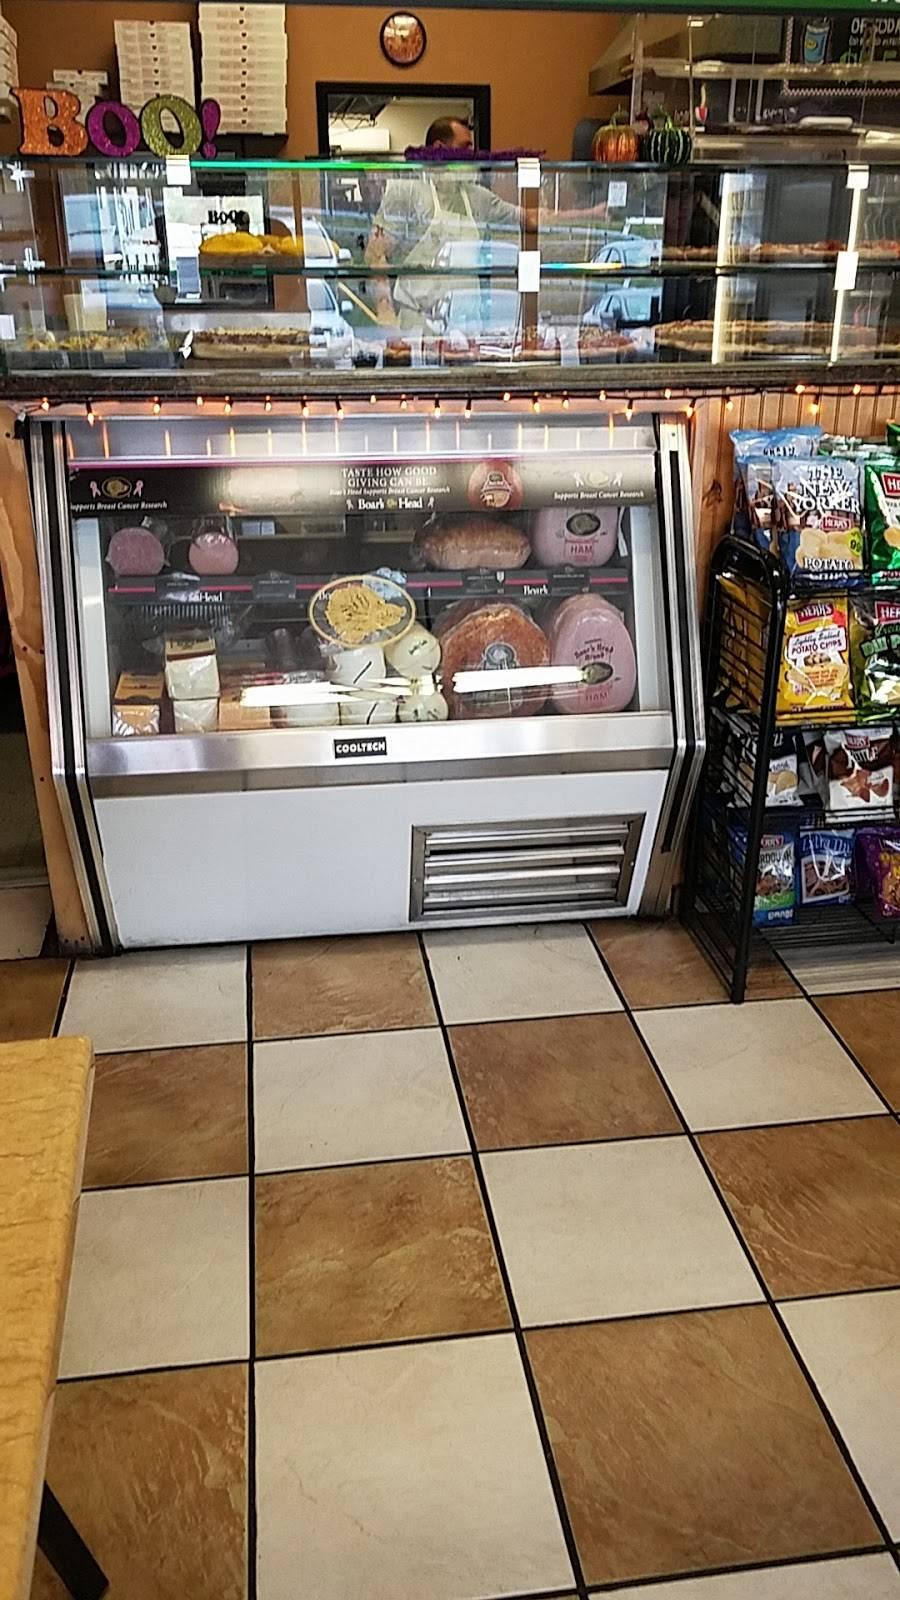 Little Pops Pizza | restaurant | 87 Homestead Ave, Maybrook, NY 12543, USA | 8456364156 OR +1 845-636-4156